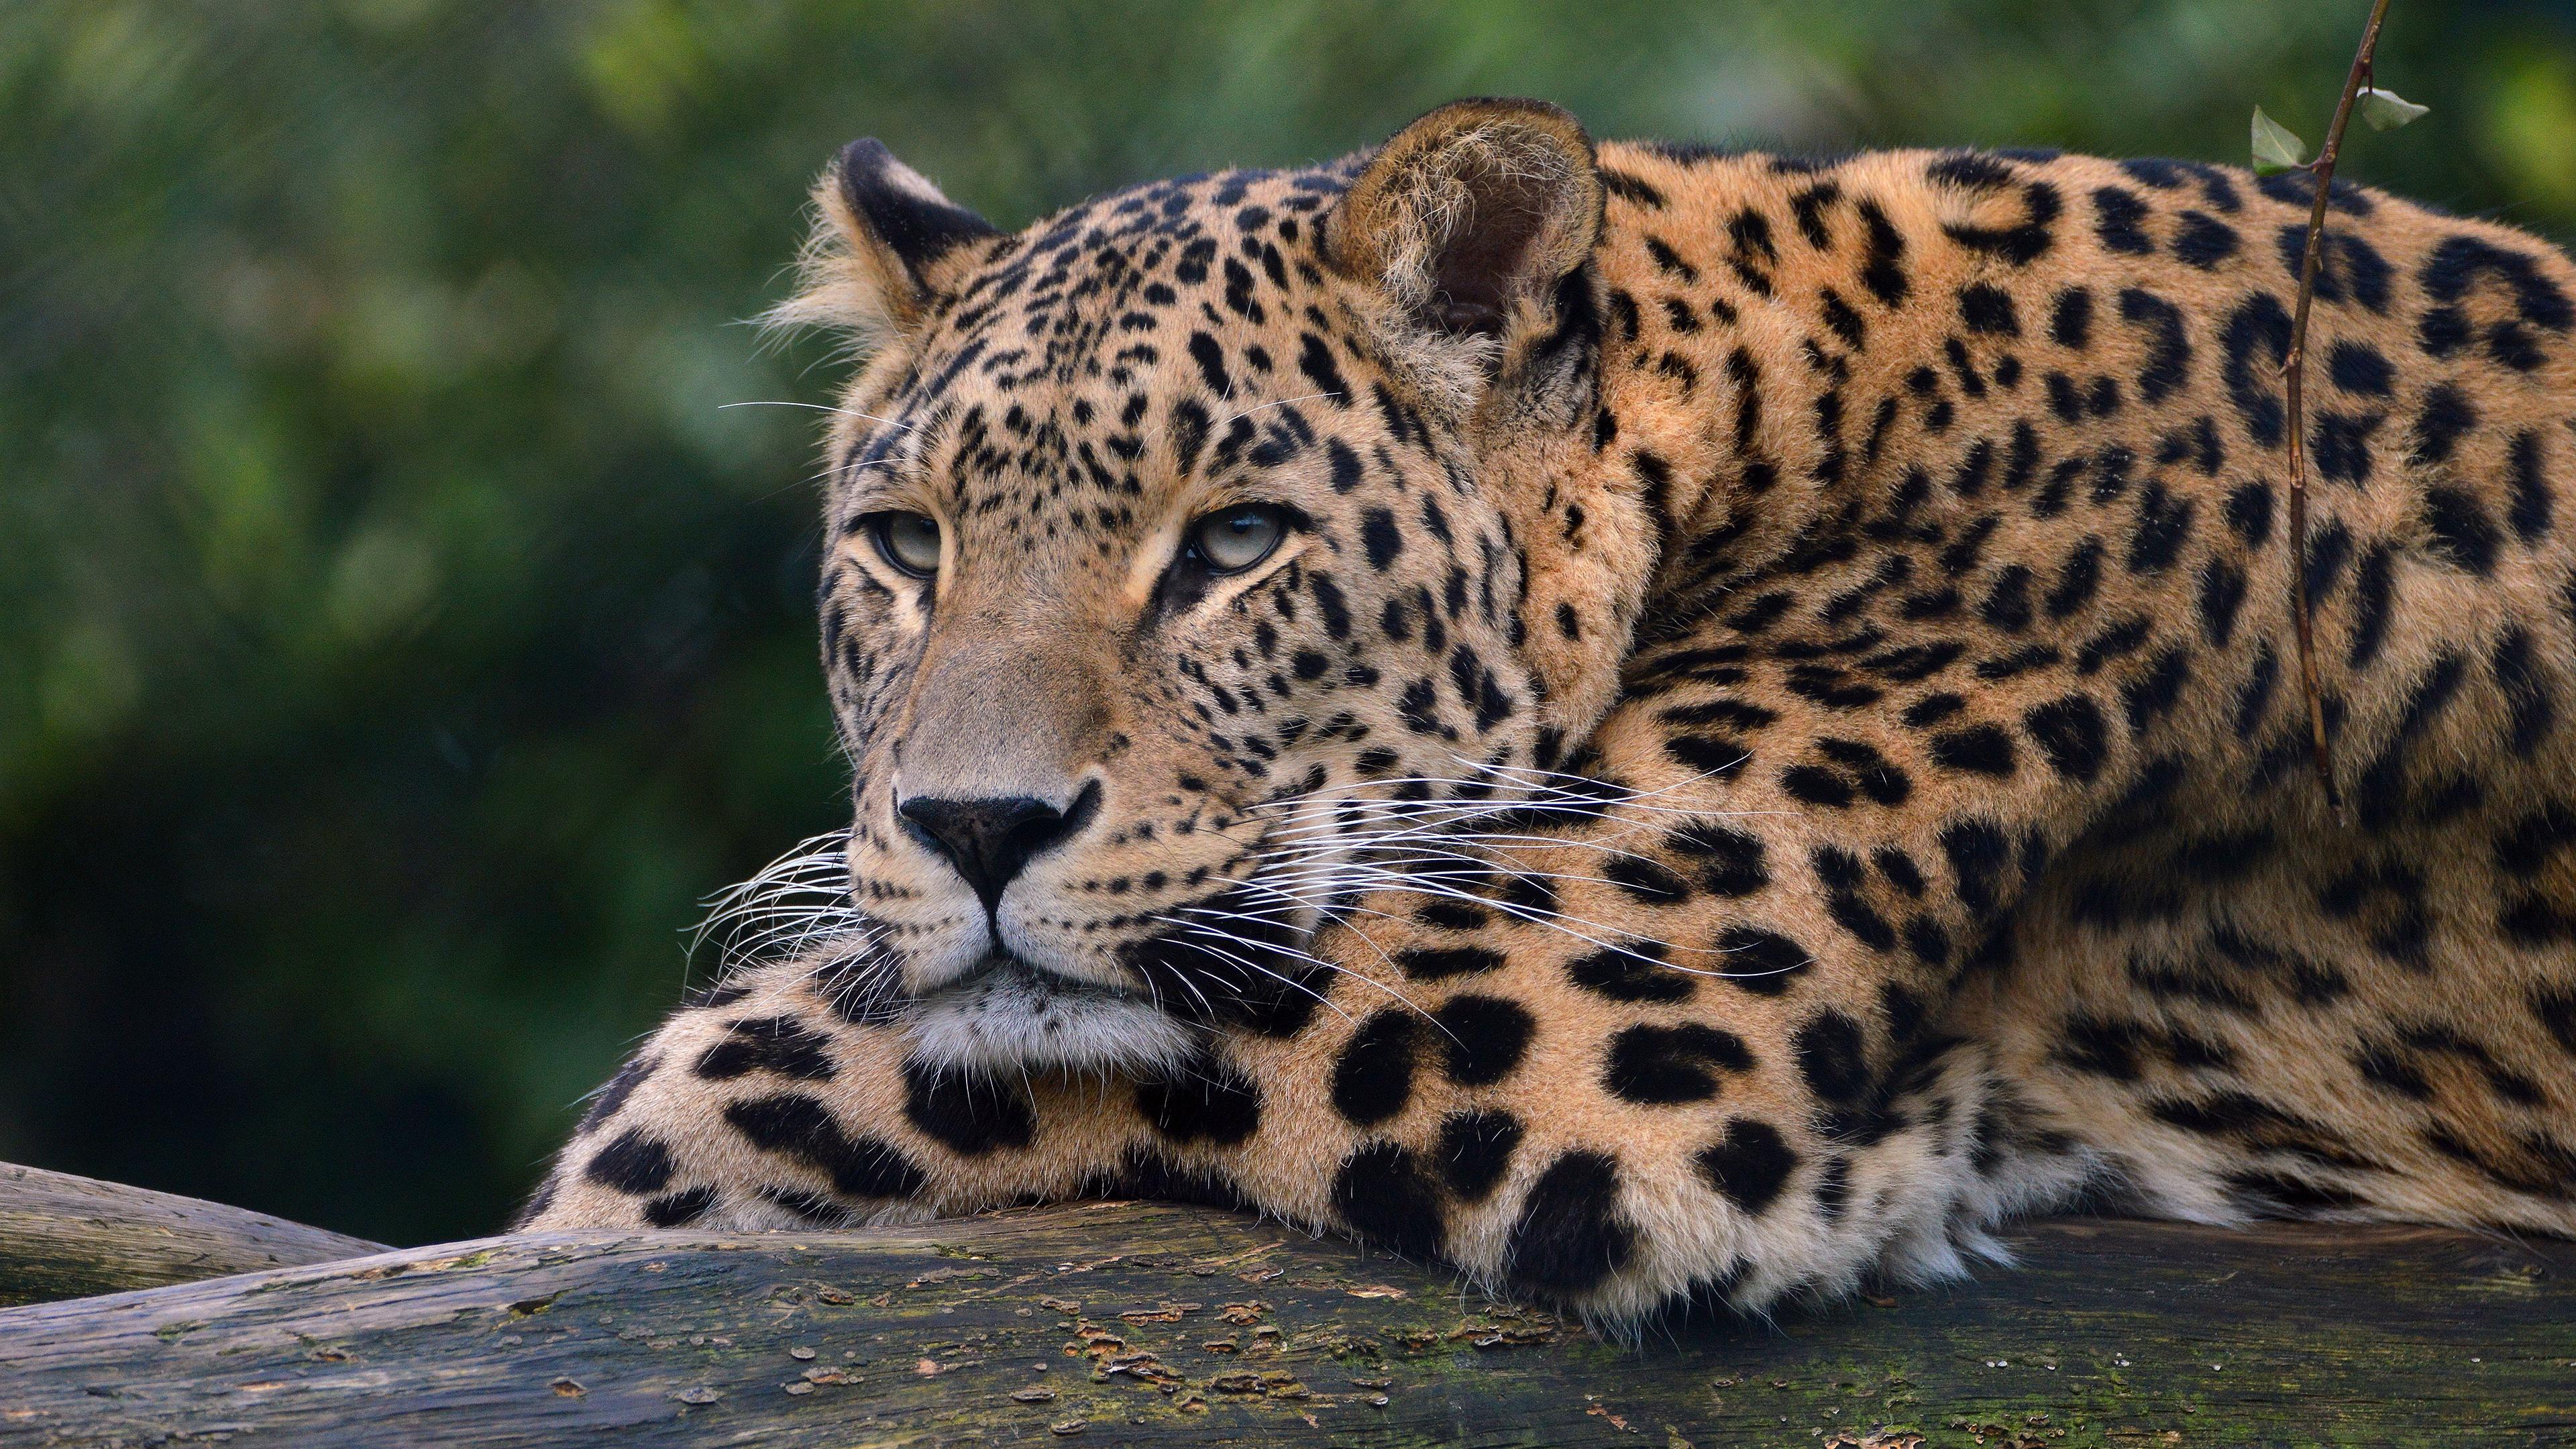 8k Animal Wallpaper Download: Leopard Ultra Hd 4k, HD Animals, 4k Wallpapers, Images